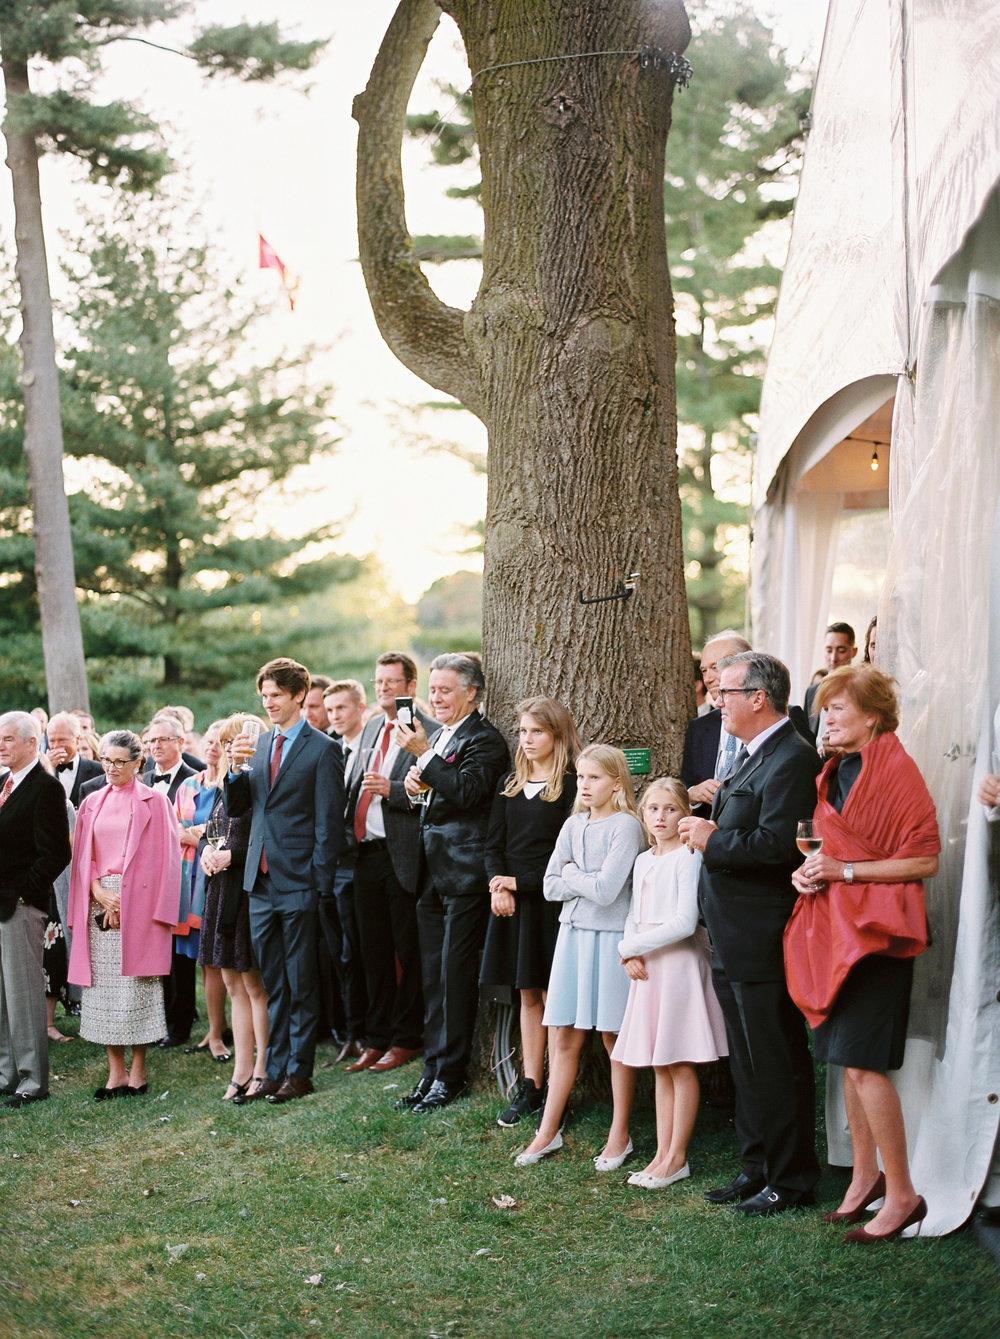 0702-Geneva-Ian-Wedding-Toronto Golf Club-When He Found Her-TorontoPhotographer.jpg